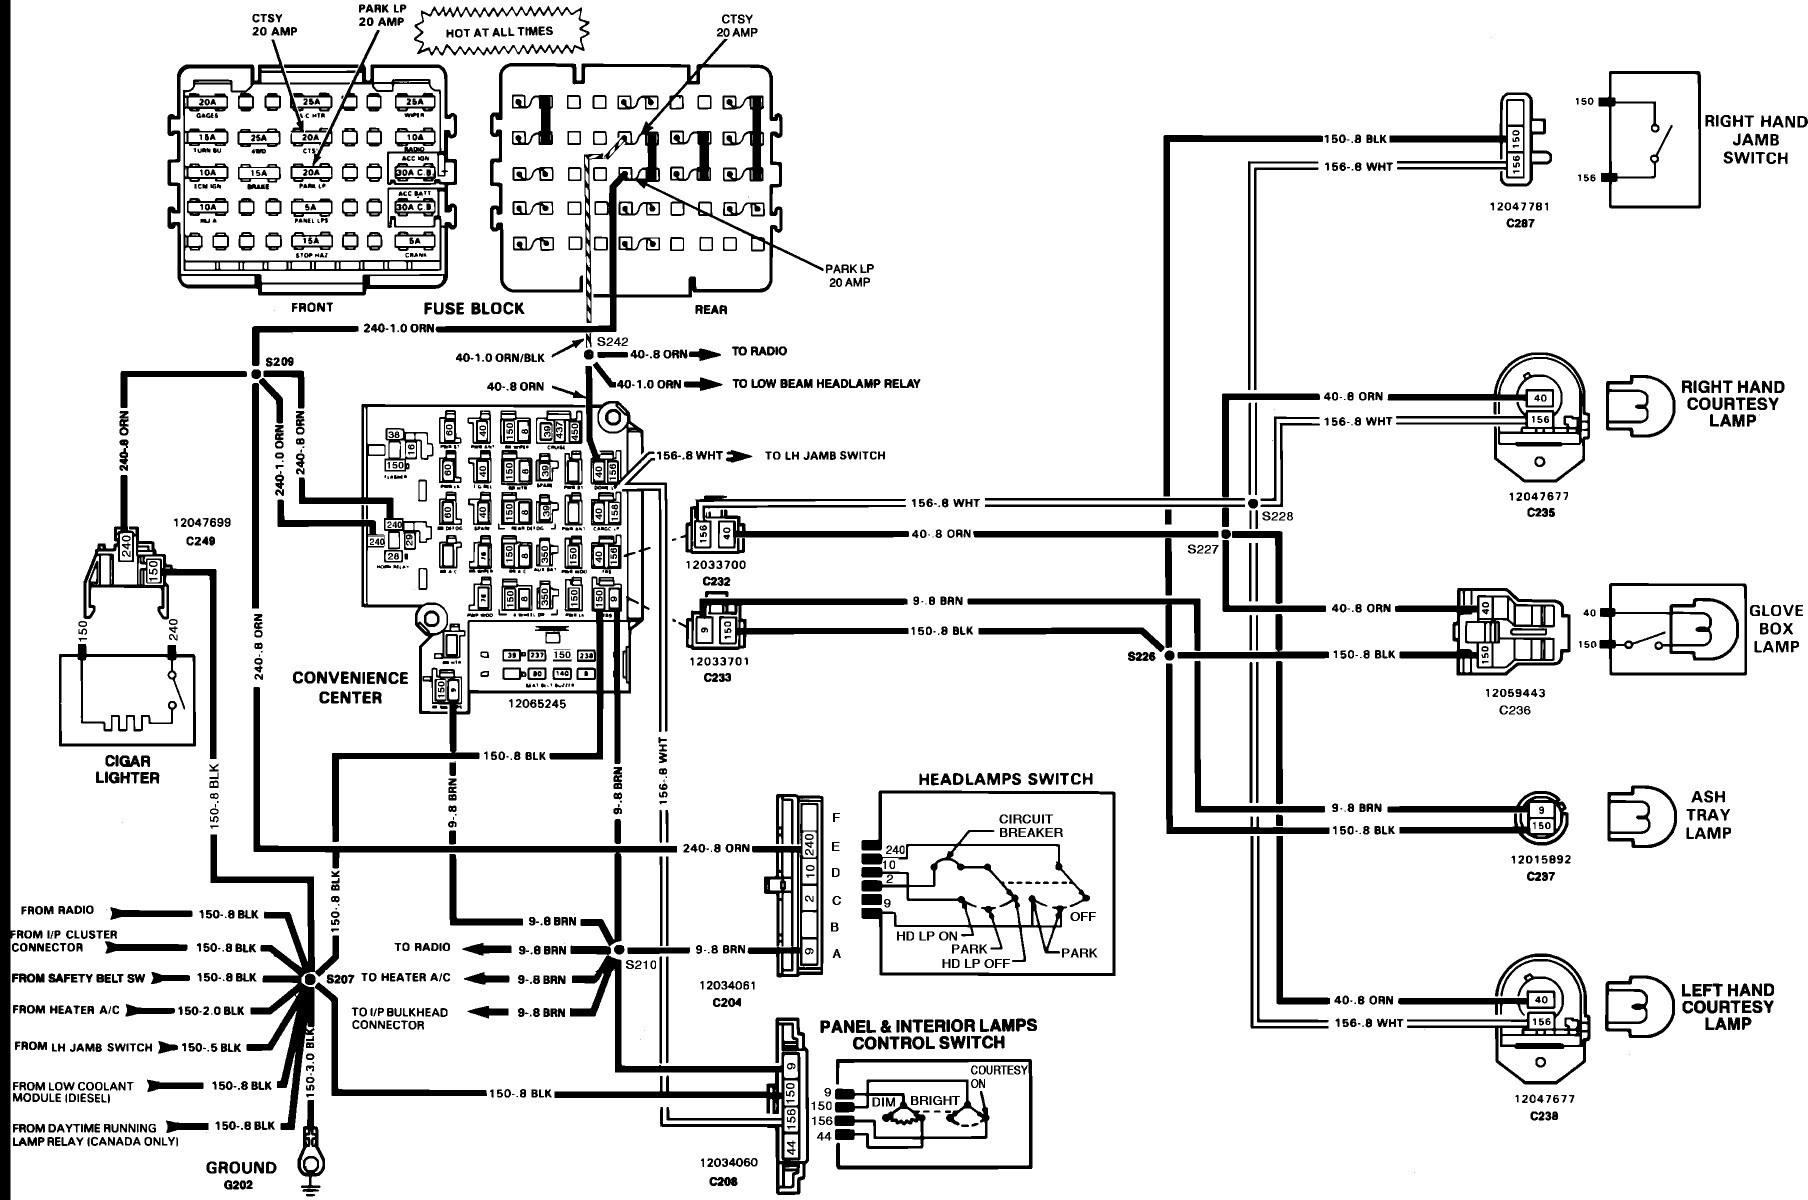 06 Silverado Tail Light Wiring Diagram   Wiring Diagram - Tail Light Wiring Diagram 1995 Chevy Truck